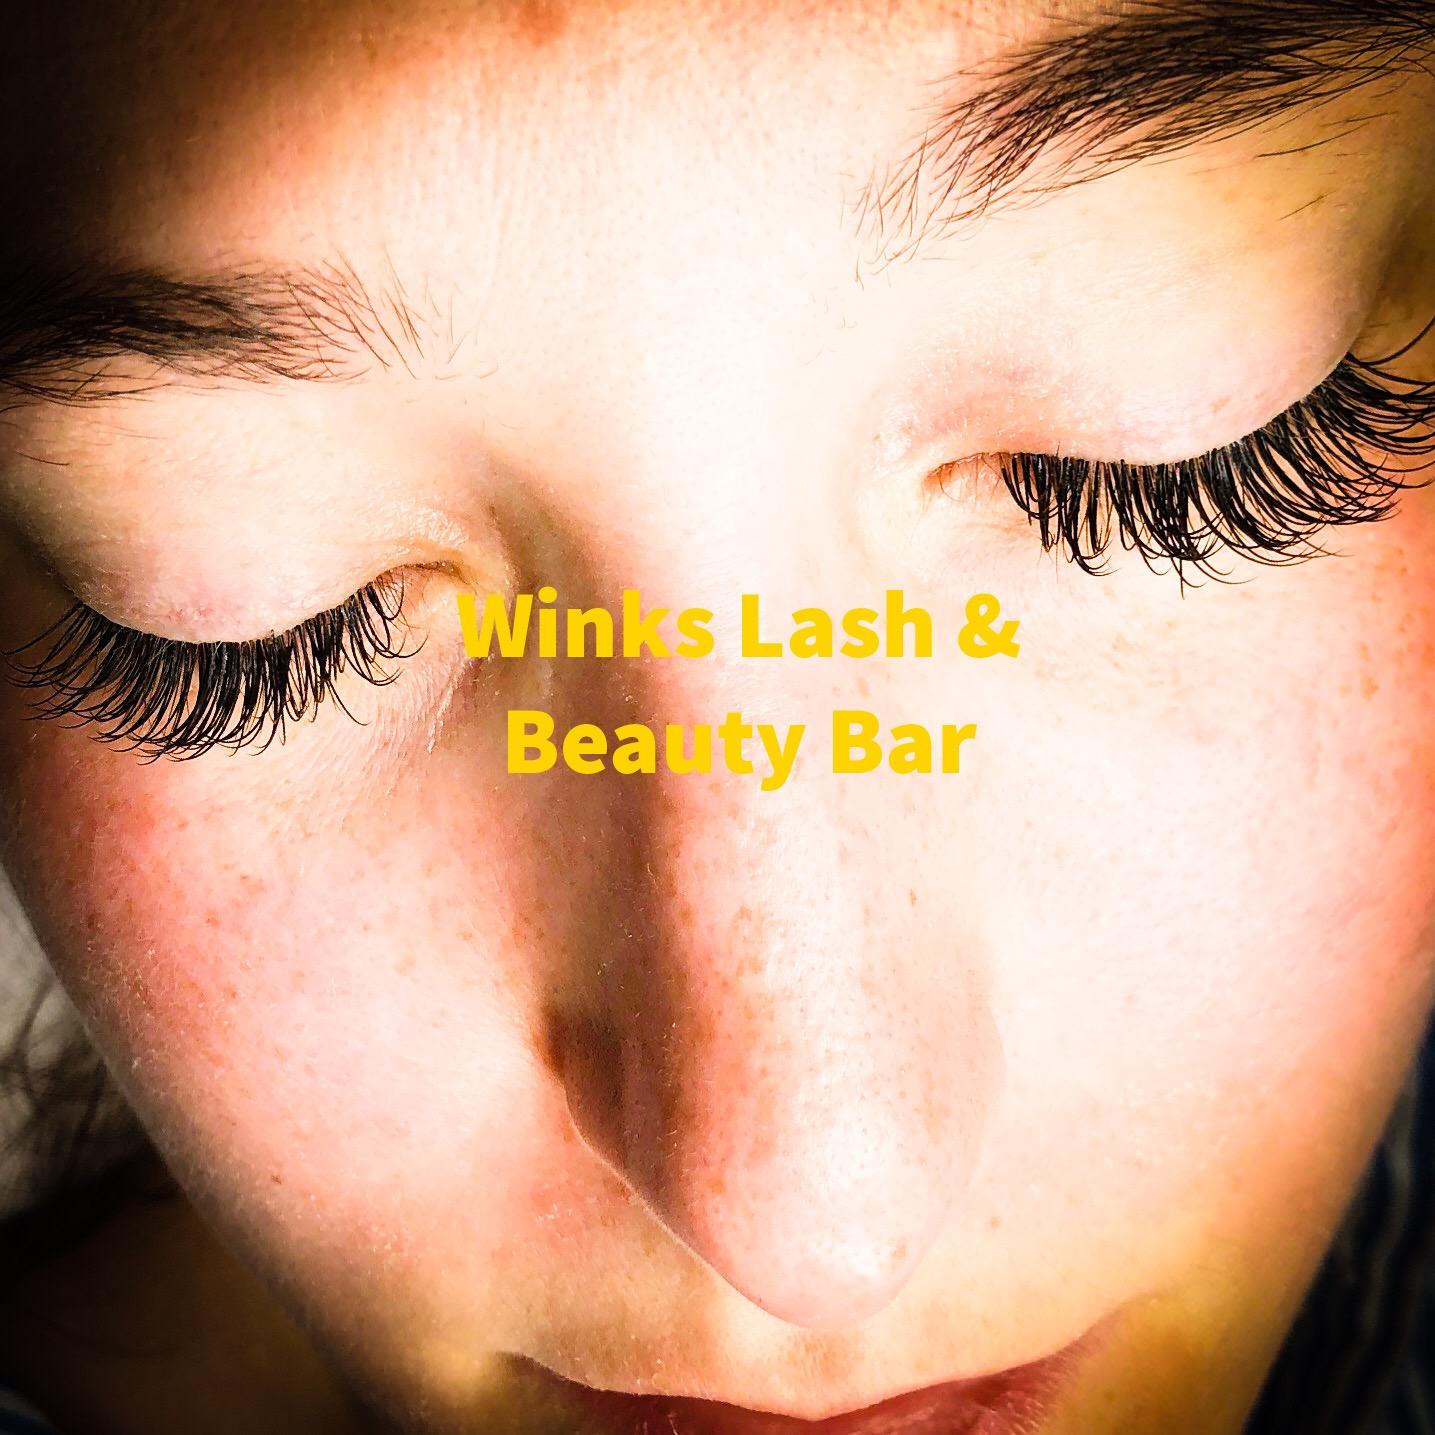 Winks Lash & Beauty Bar by Juan